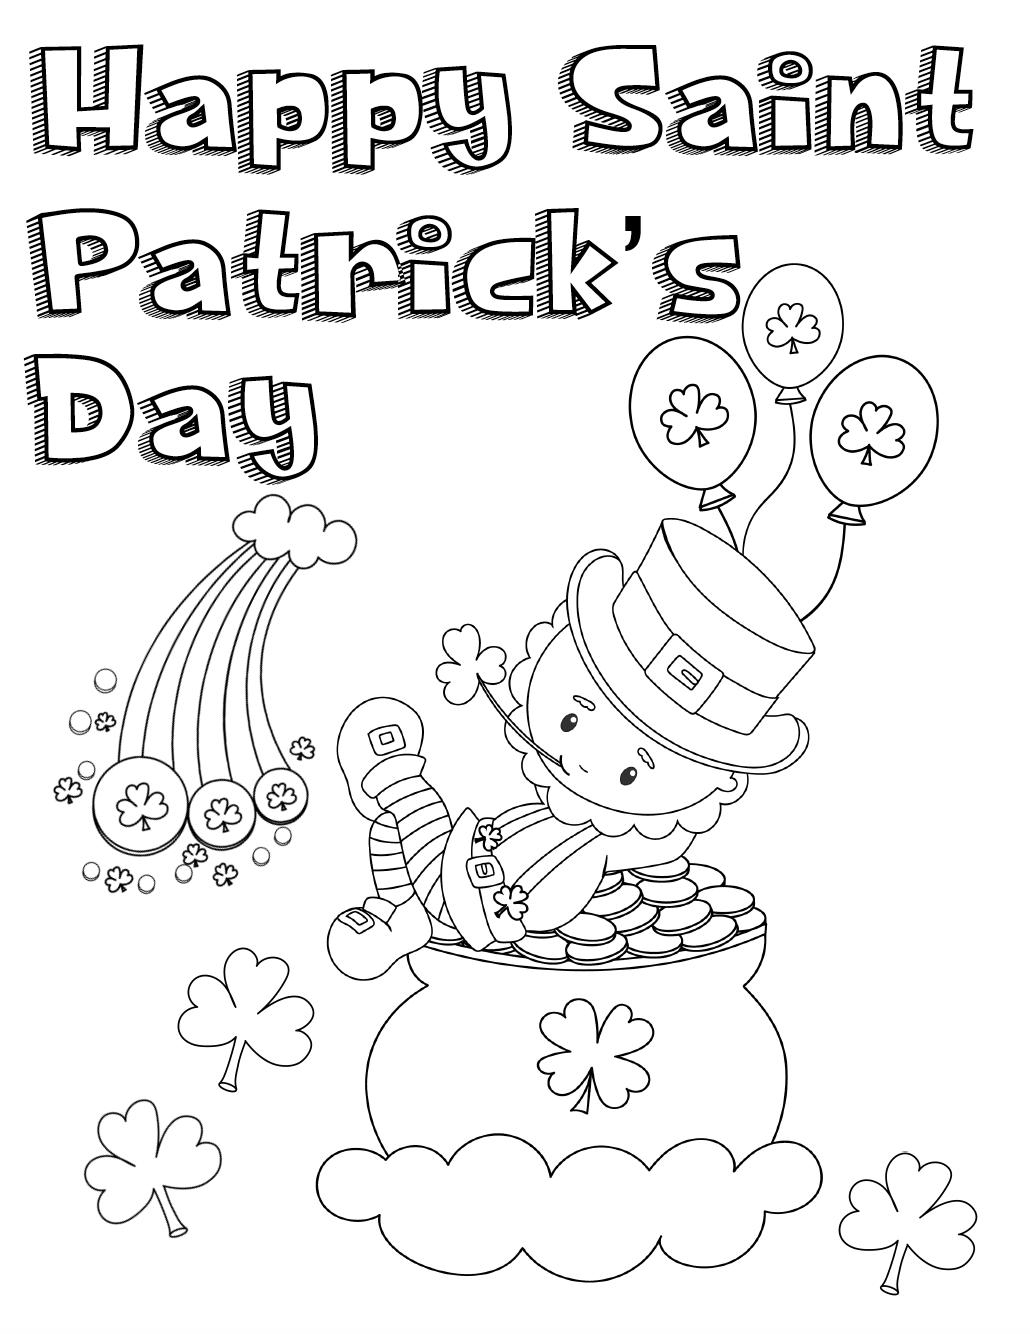 printable coloring sheets st patricks day st patrick39s day free printables universal publishing day coloring printable patricks st sheets